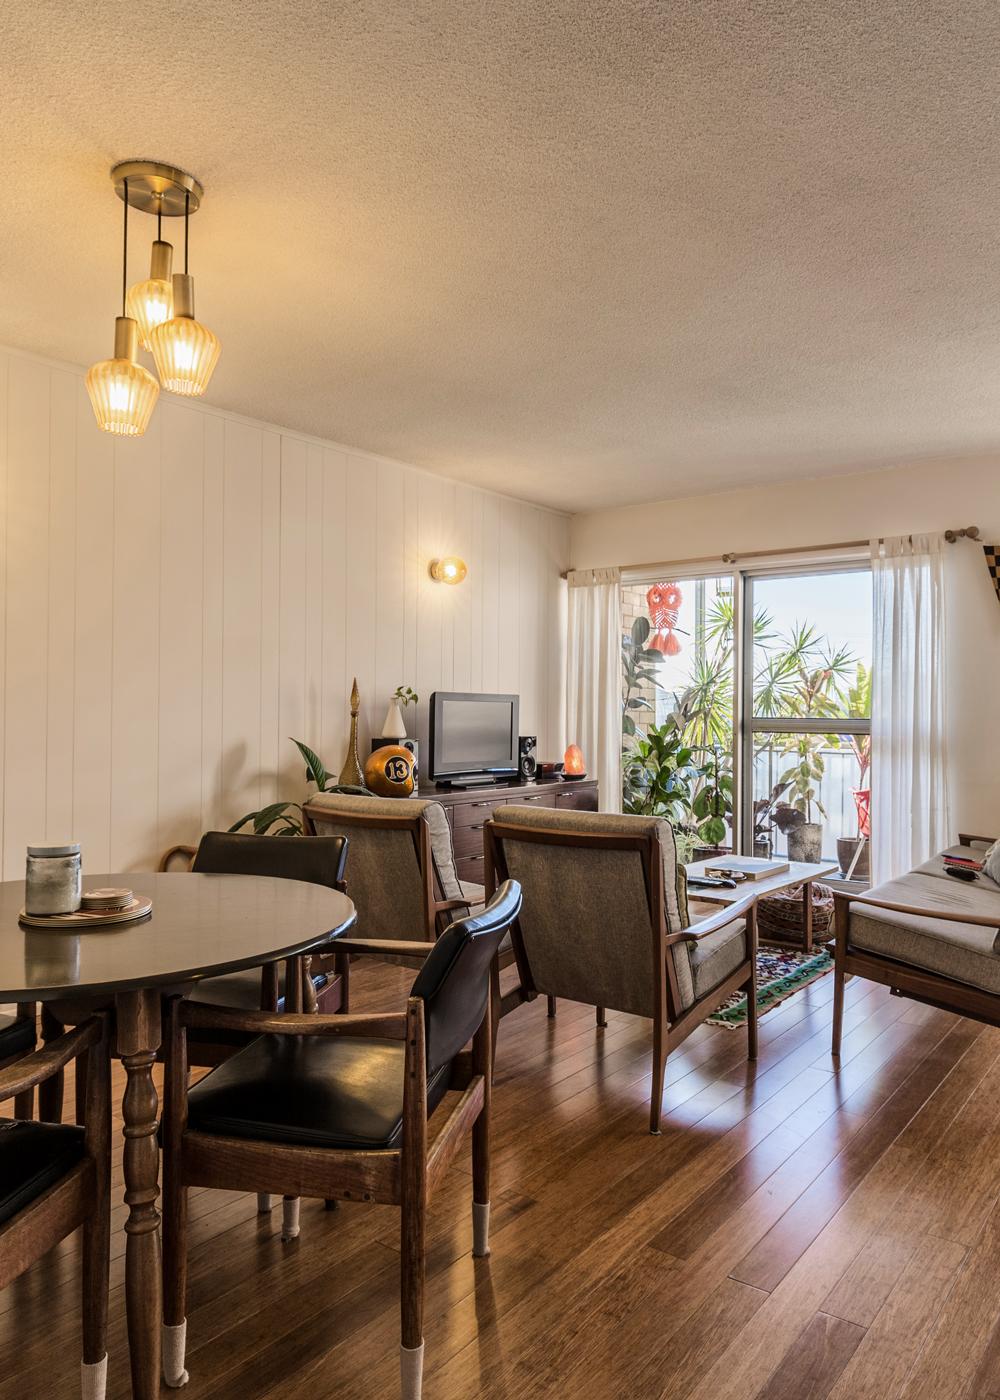 jefflevingston-interior-apartment.jpg